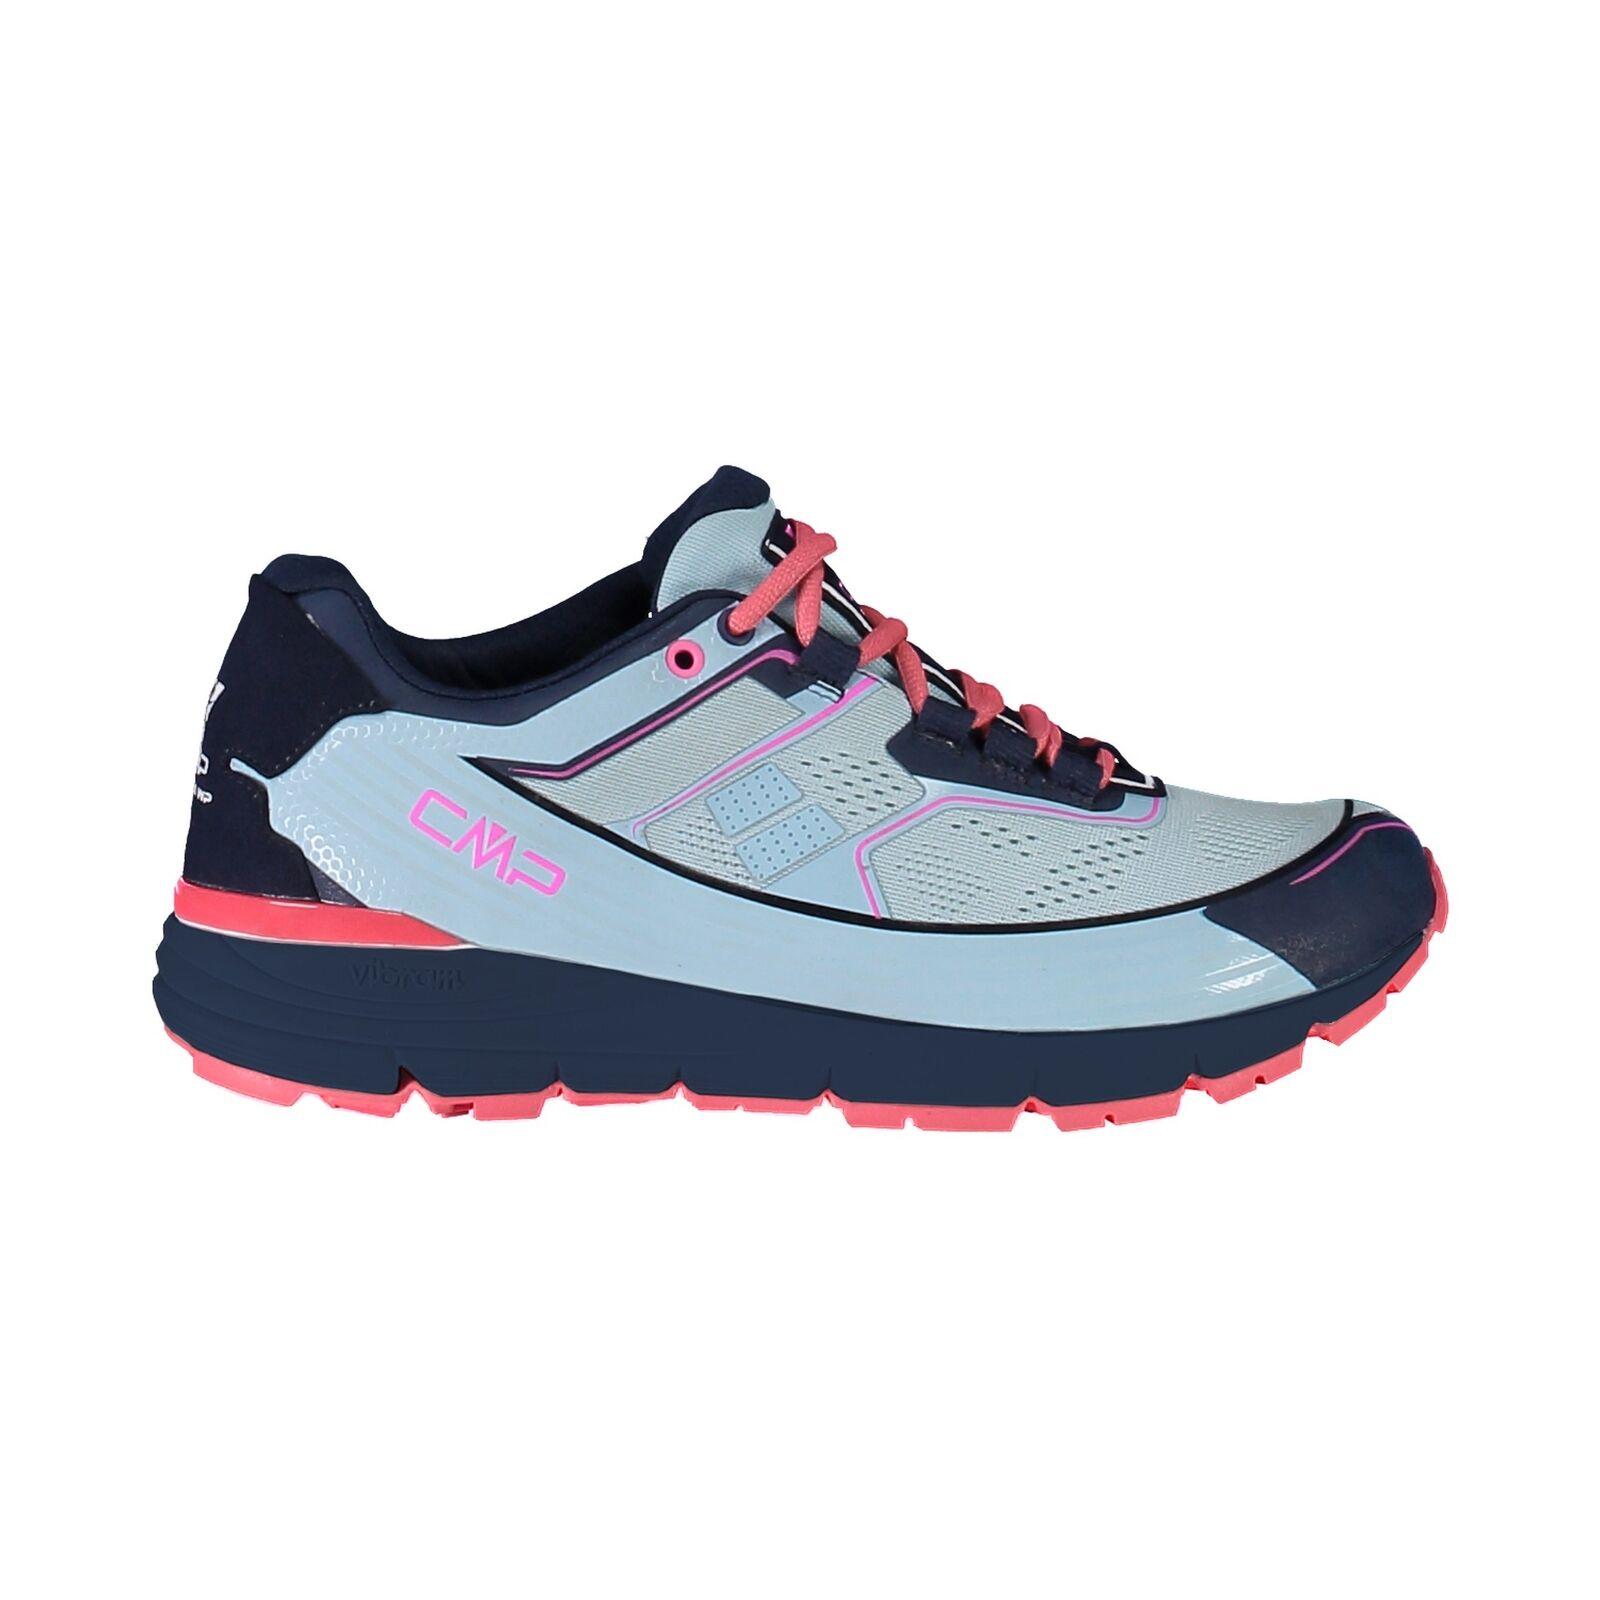 CMP shoes  da Corsa Sport Kursa Wmn Trail shoes Wp Azzurro Pianura  buy best